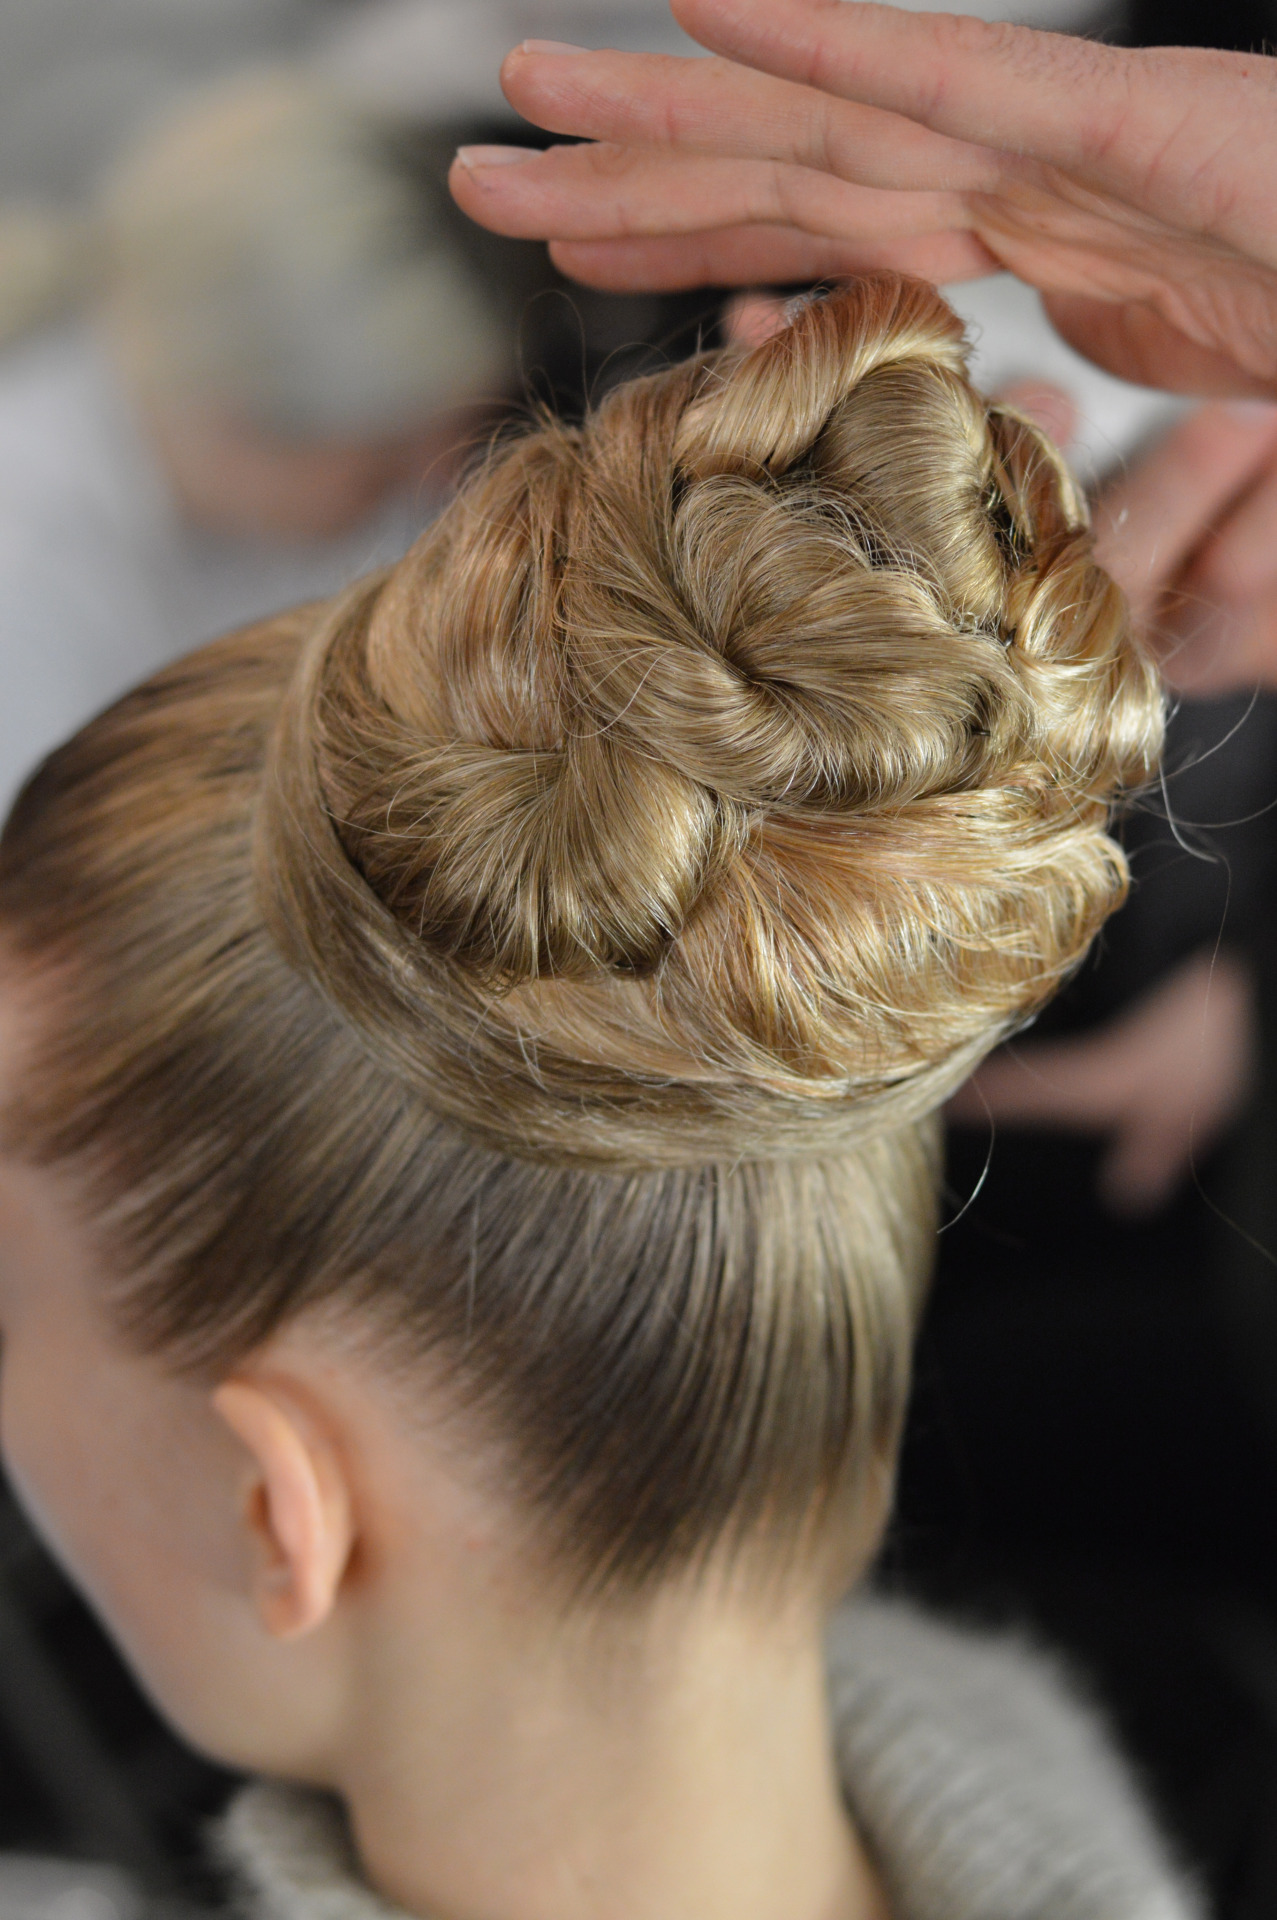 Sky high buns  #backstage  at  Carolina Herrera    Hair by Orlando Pita with Bio Sleek    Image via  kristindee_  with Cult of Pretty